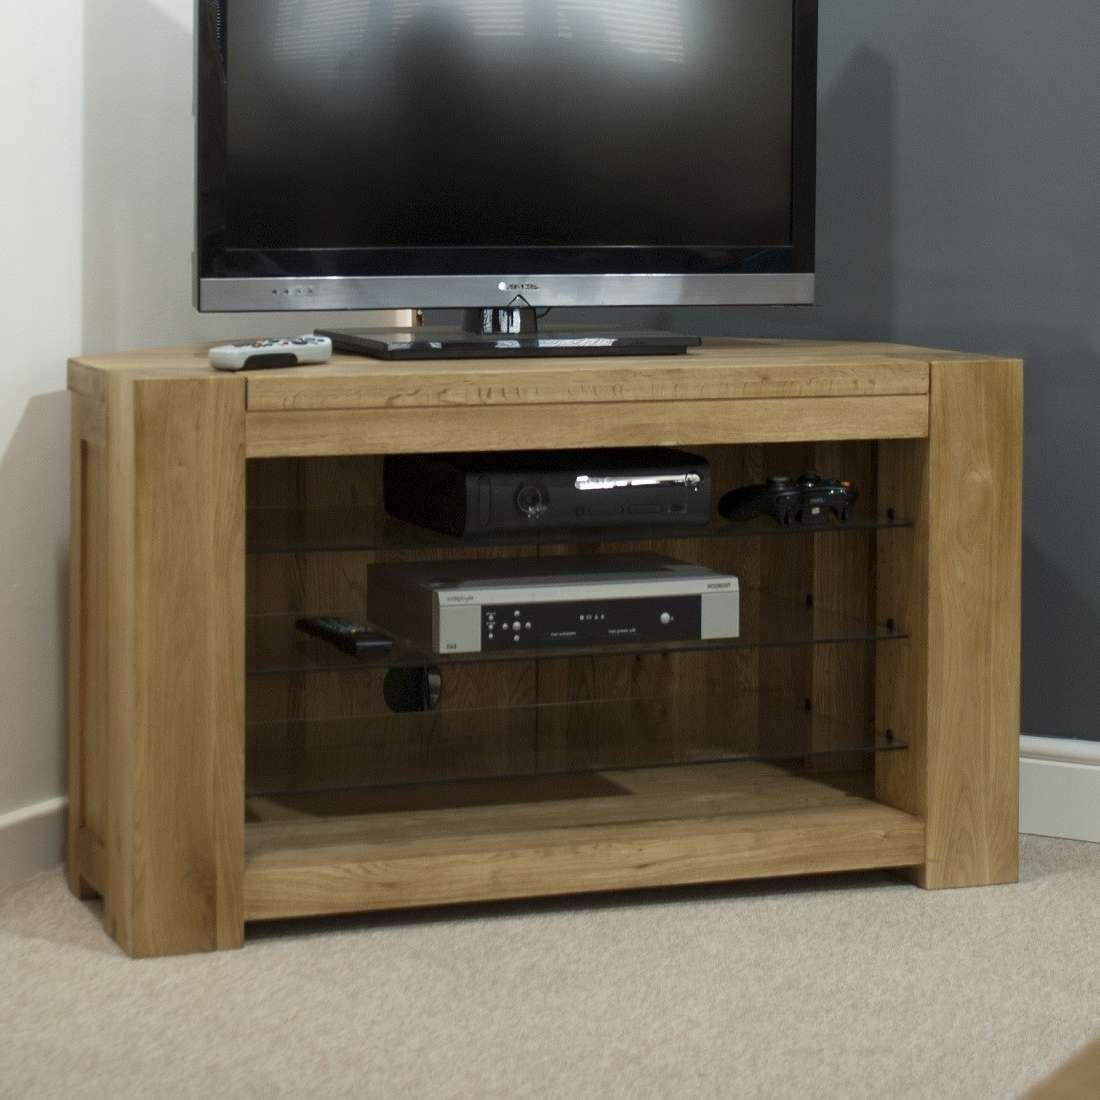 Trend Solid Oak Corner Tv Unit | Oak Furniture Uk Within Solid Wood Corner Tv Cabinets (View 9 of 20)